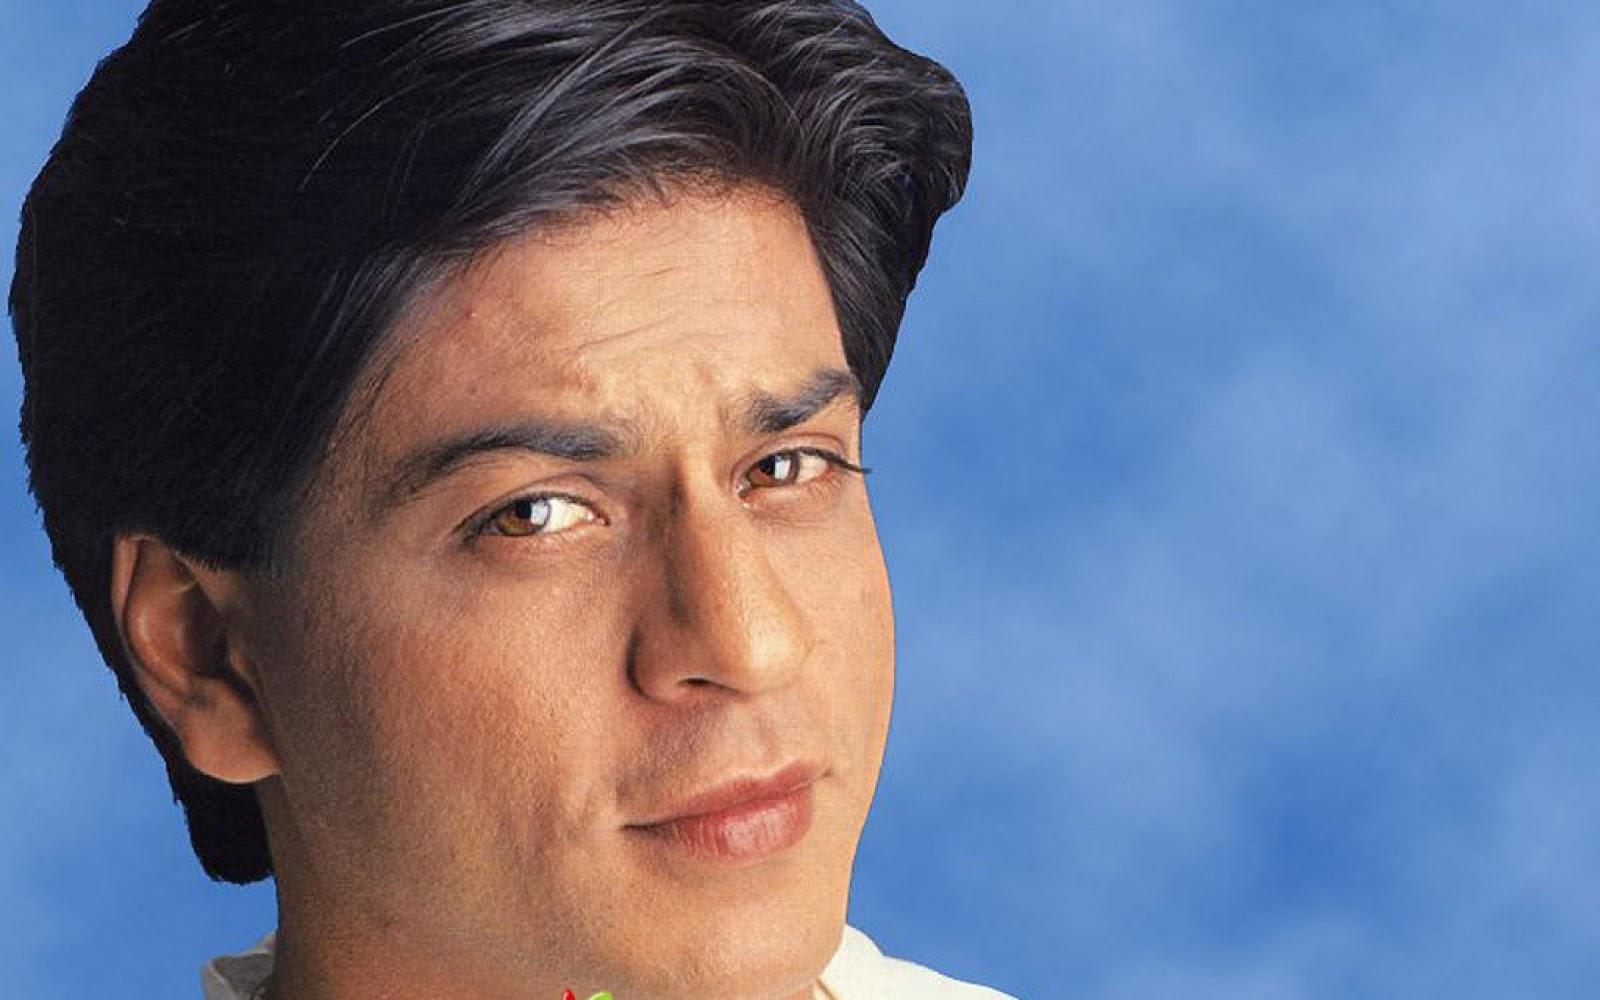 Shahrukh Khan Wallpapers Hd Download Free 1080p: Shahrukh Khan,shahrukh Khan House,shahrukh Khan And Kajol